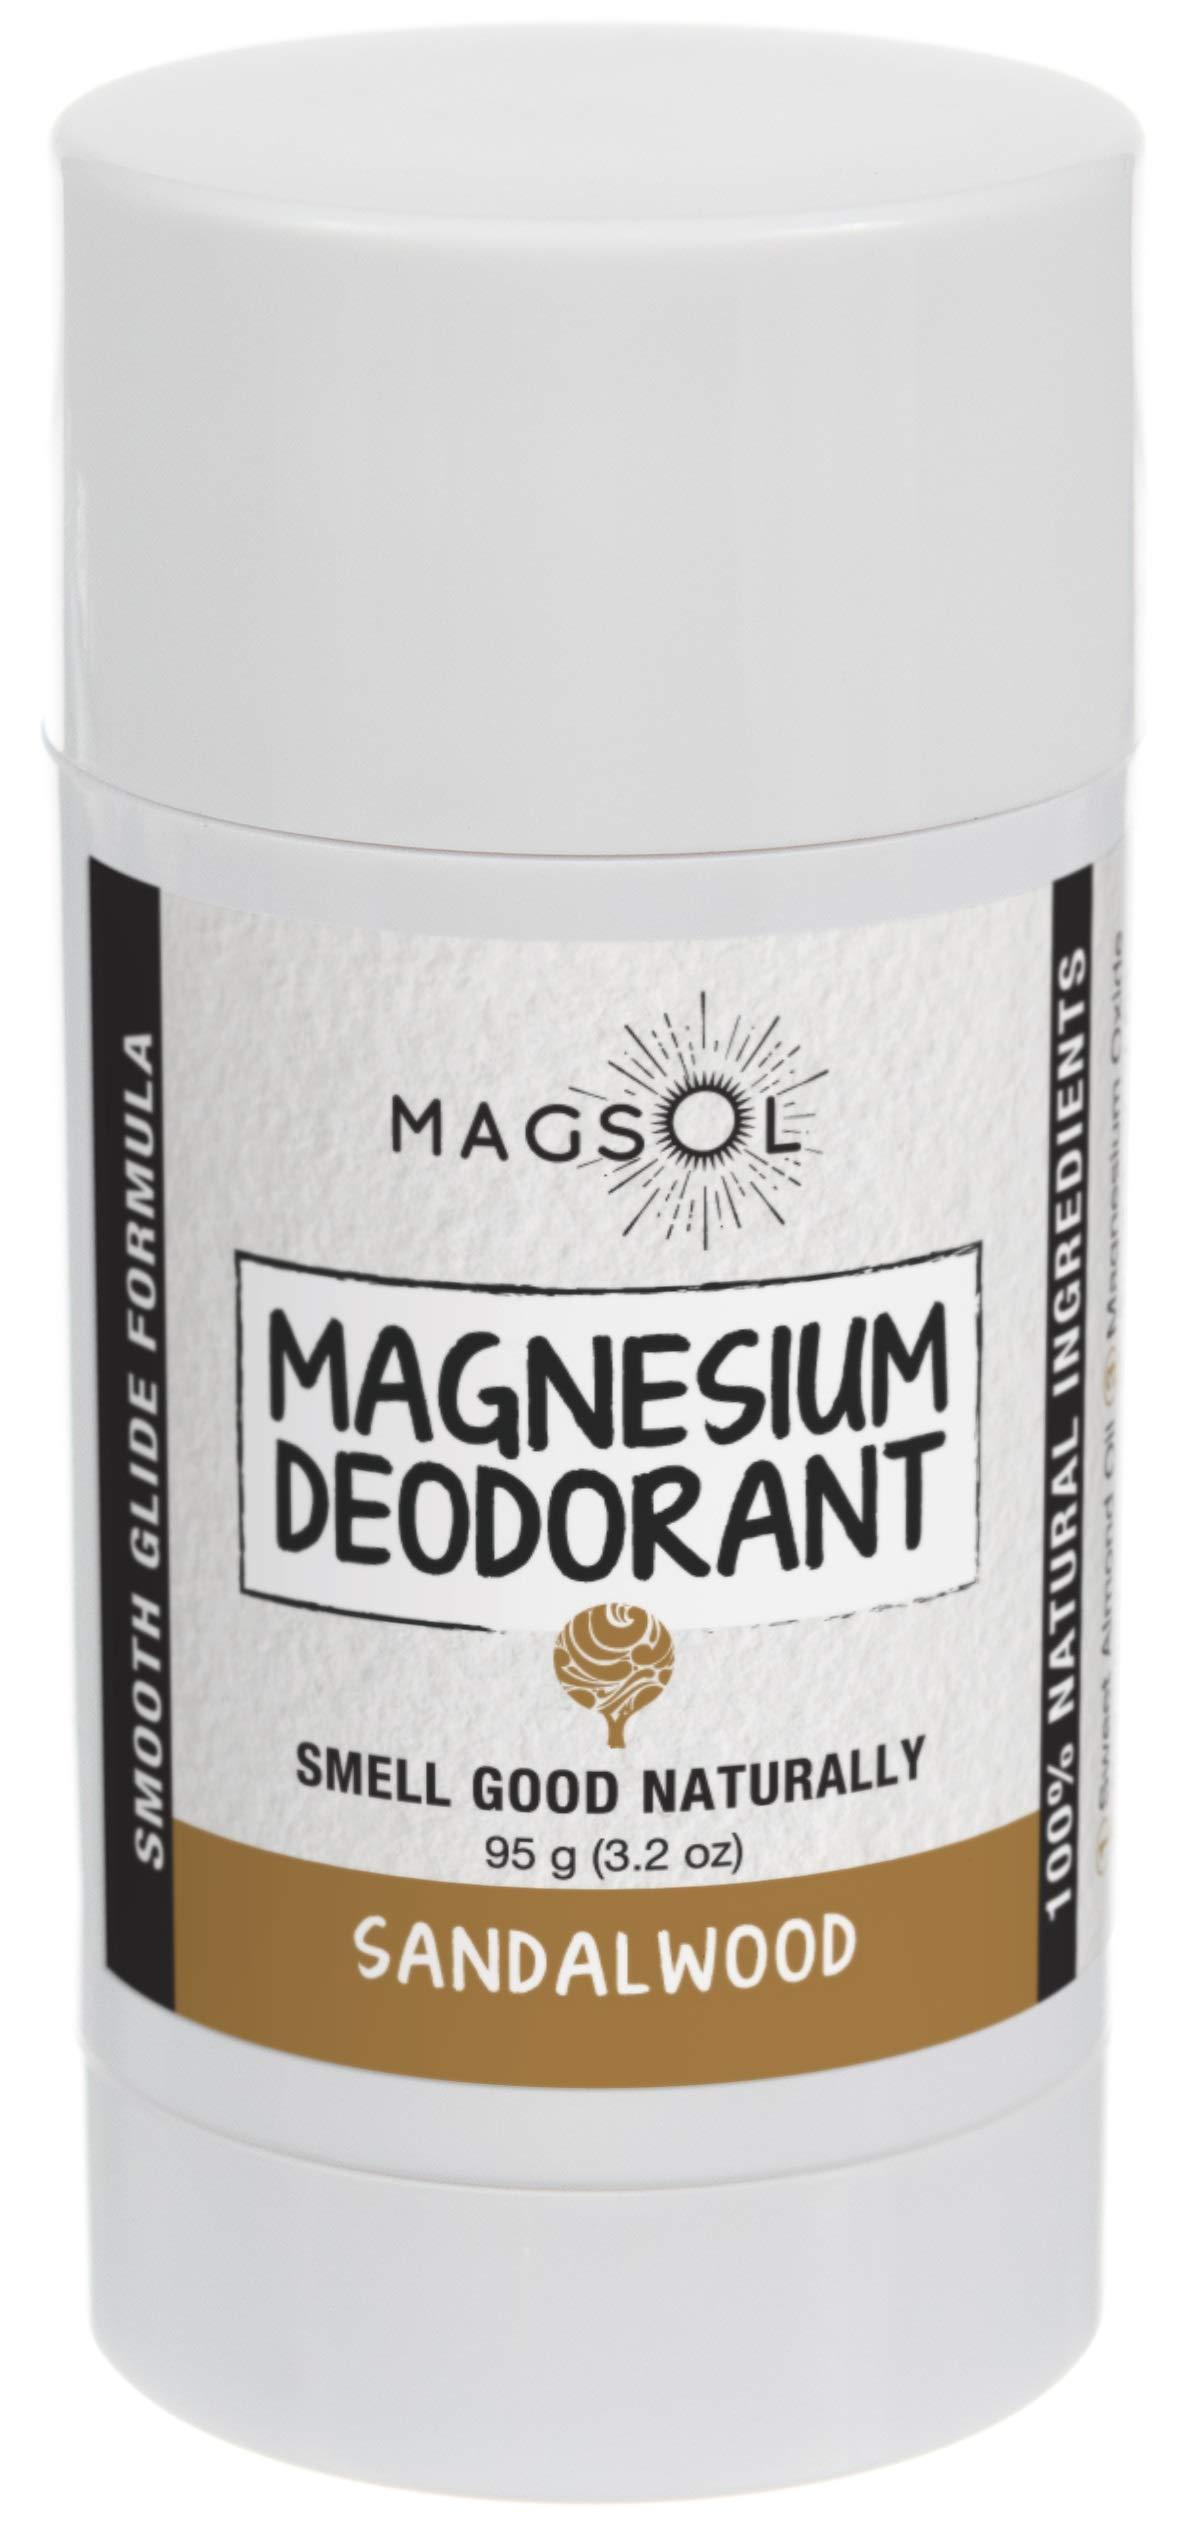 Sandalwood Magnesium Deodorant - Aluminum Free, Baking Soda Free, Alcohol Free, Cruelty Free, Sensitive Skin, All Natural, For Women Men Boys Girls Kids - 2.8 oz (Lasts over 4 months)